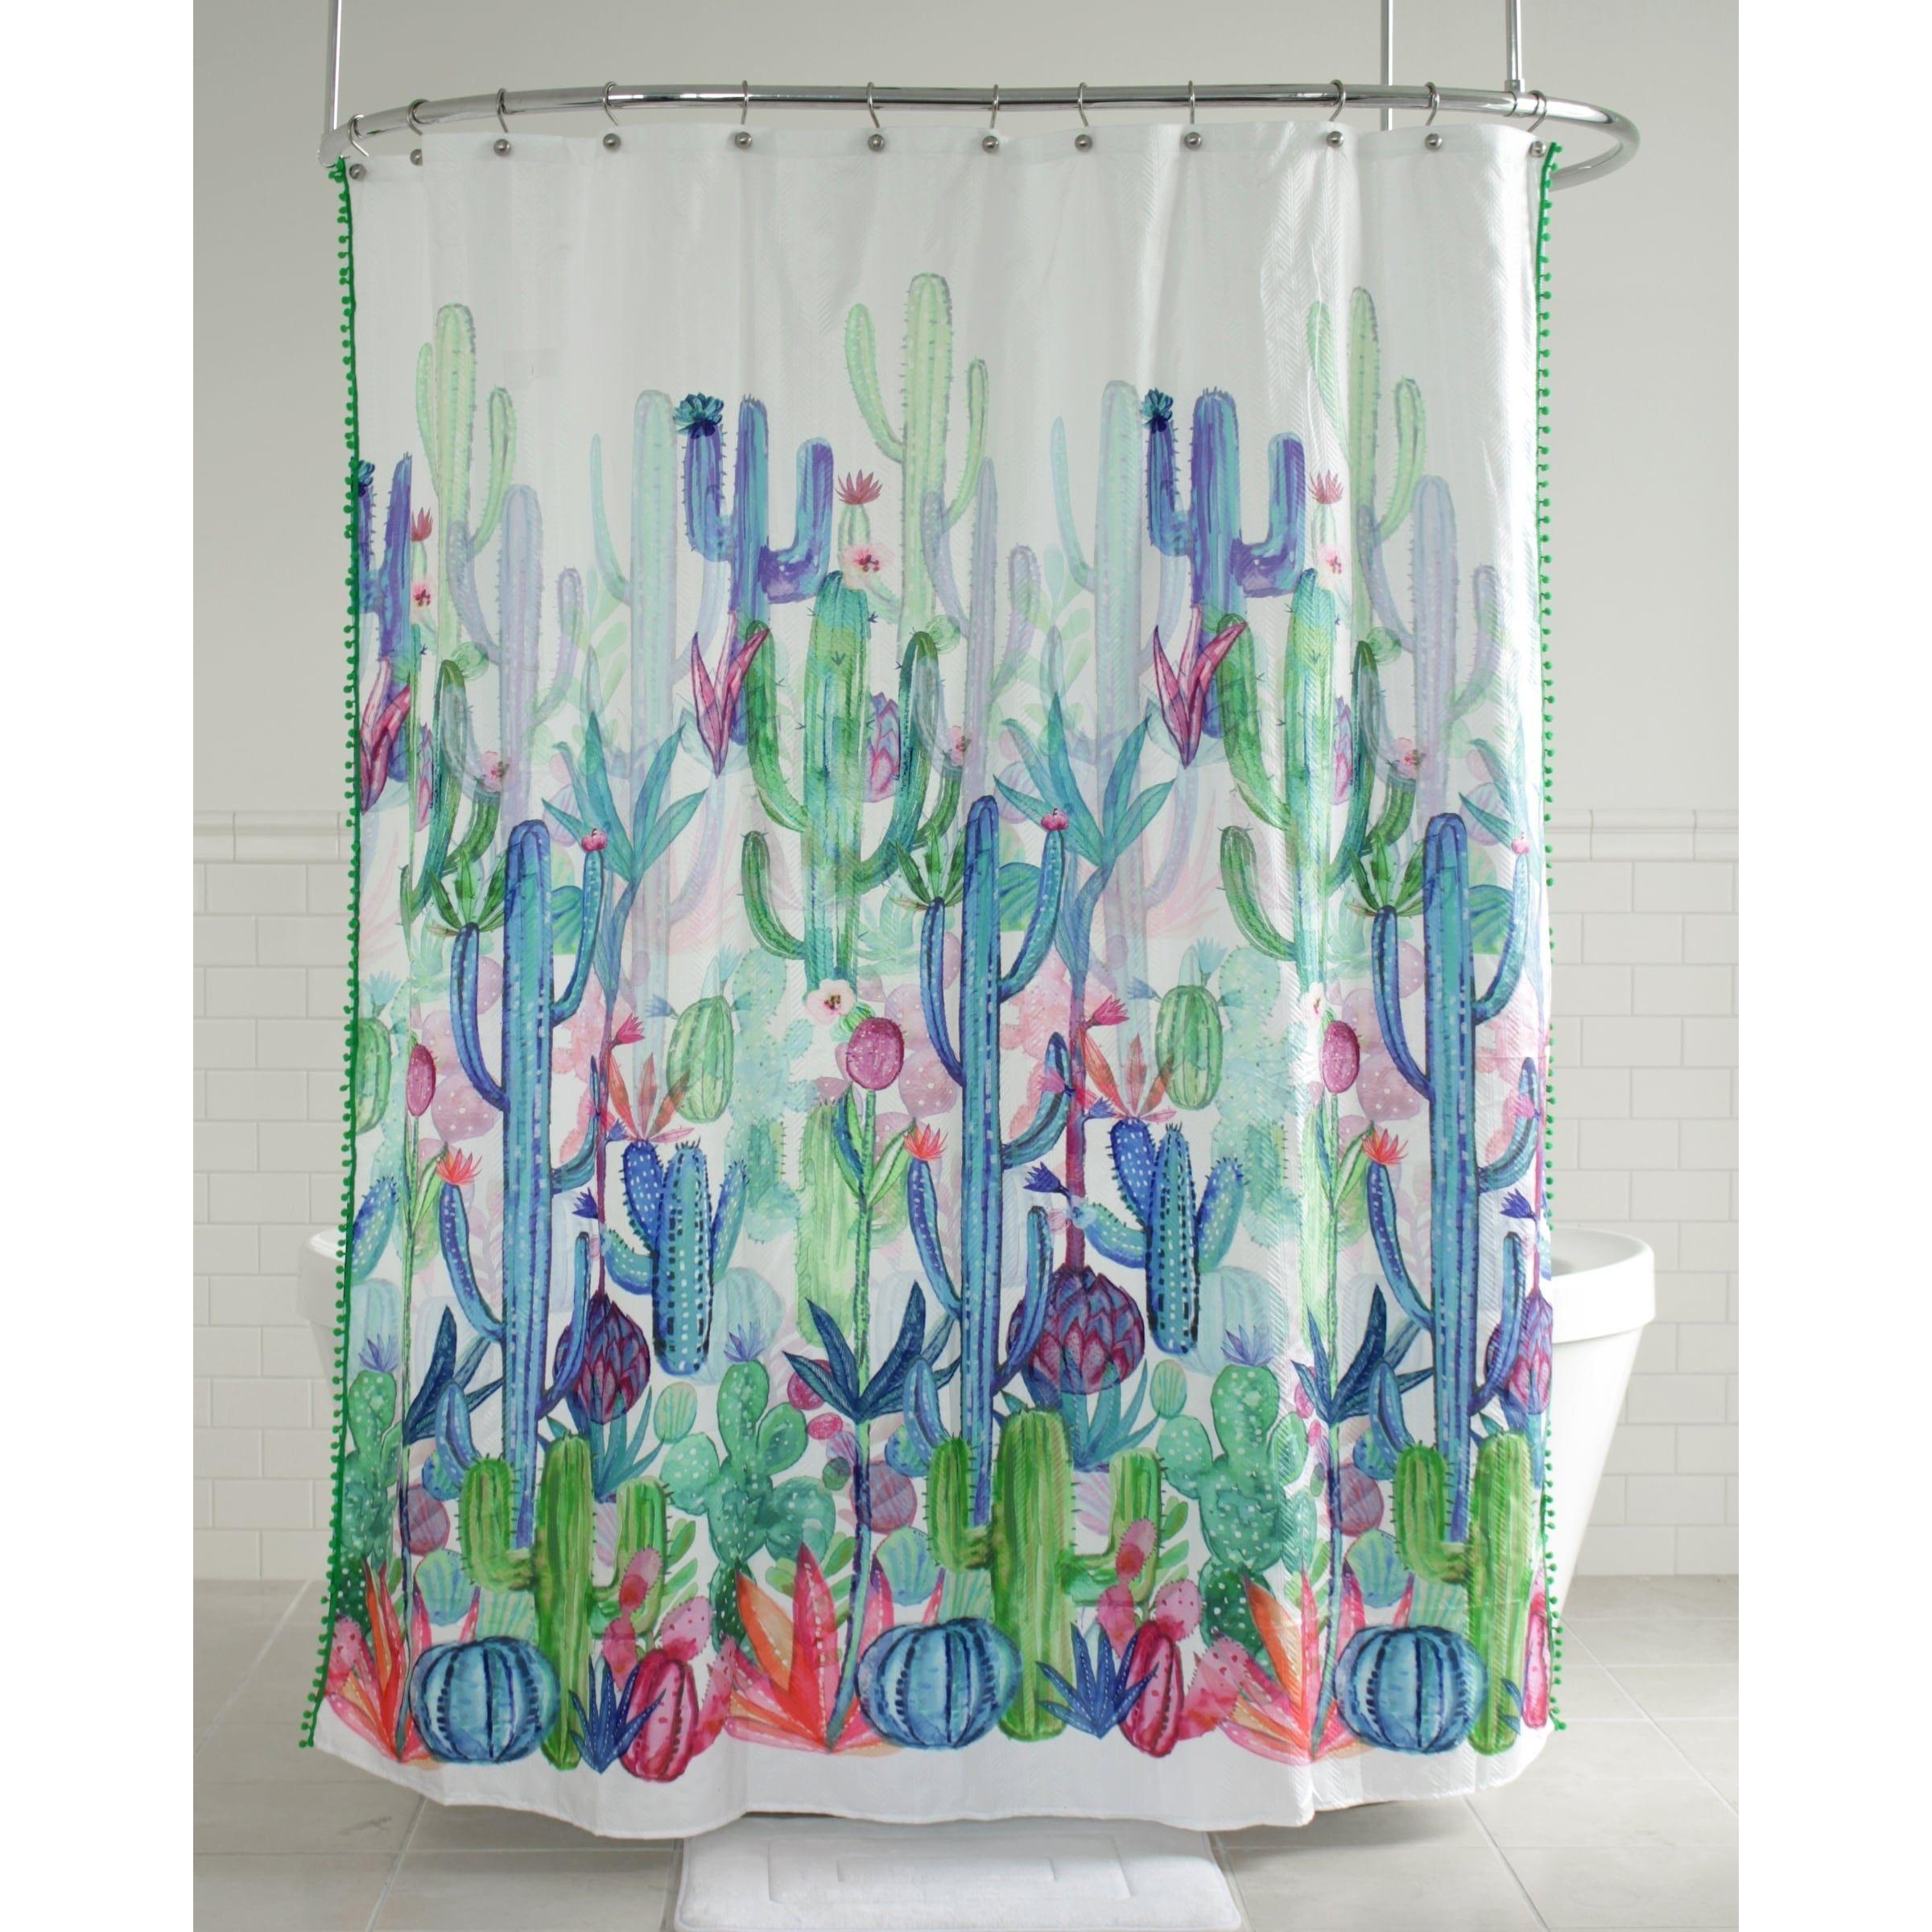 Splash Home Gobi Cactus Polyester Fabric Shower Curtain Multi